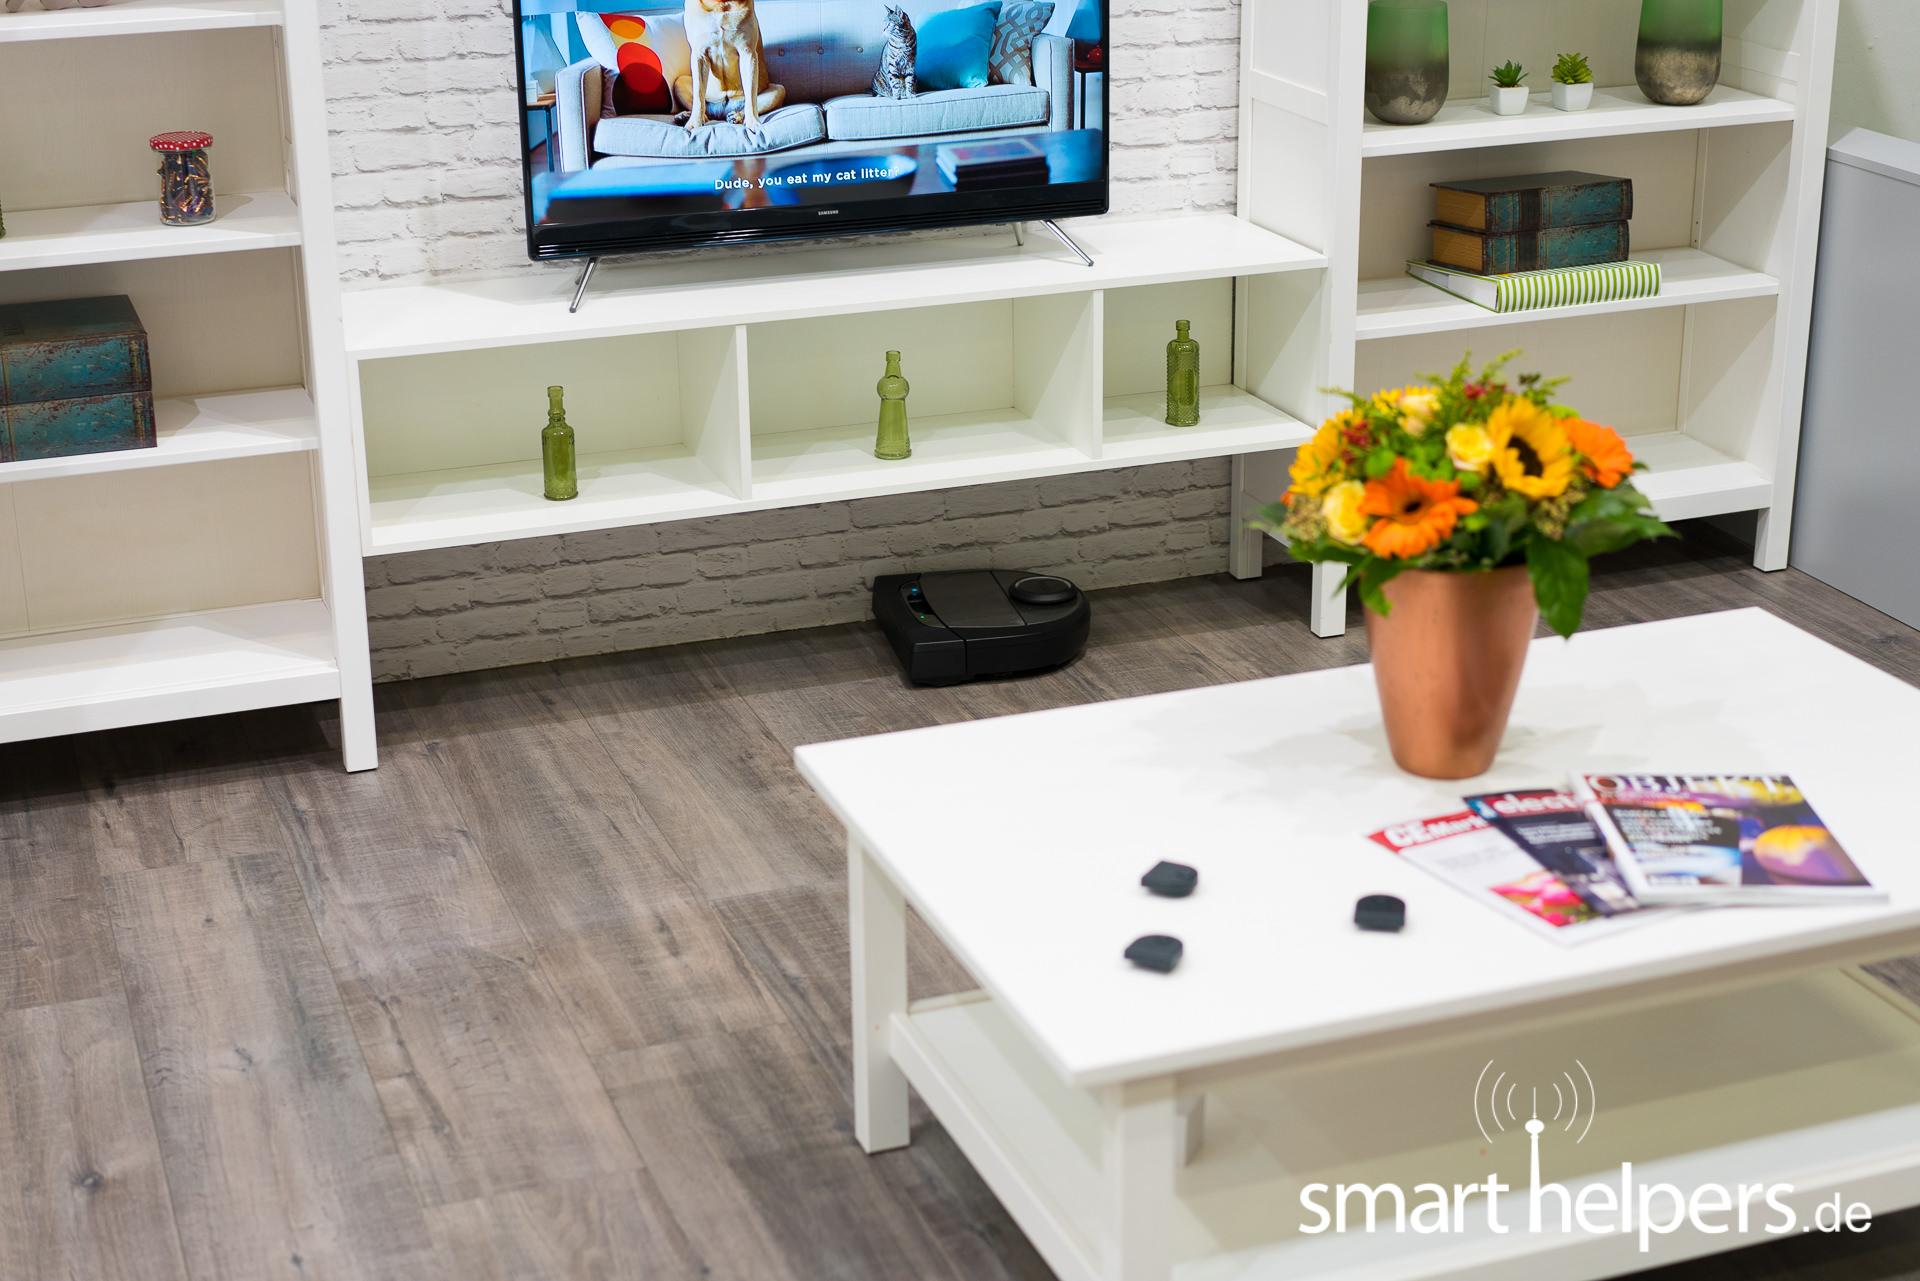 ifa 2017 neato zeigt staubsaugerroboter mit praktischer app. Black Bedroom Furniture Sets. Home Design Ideas